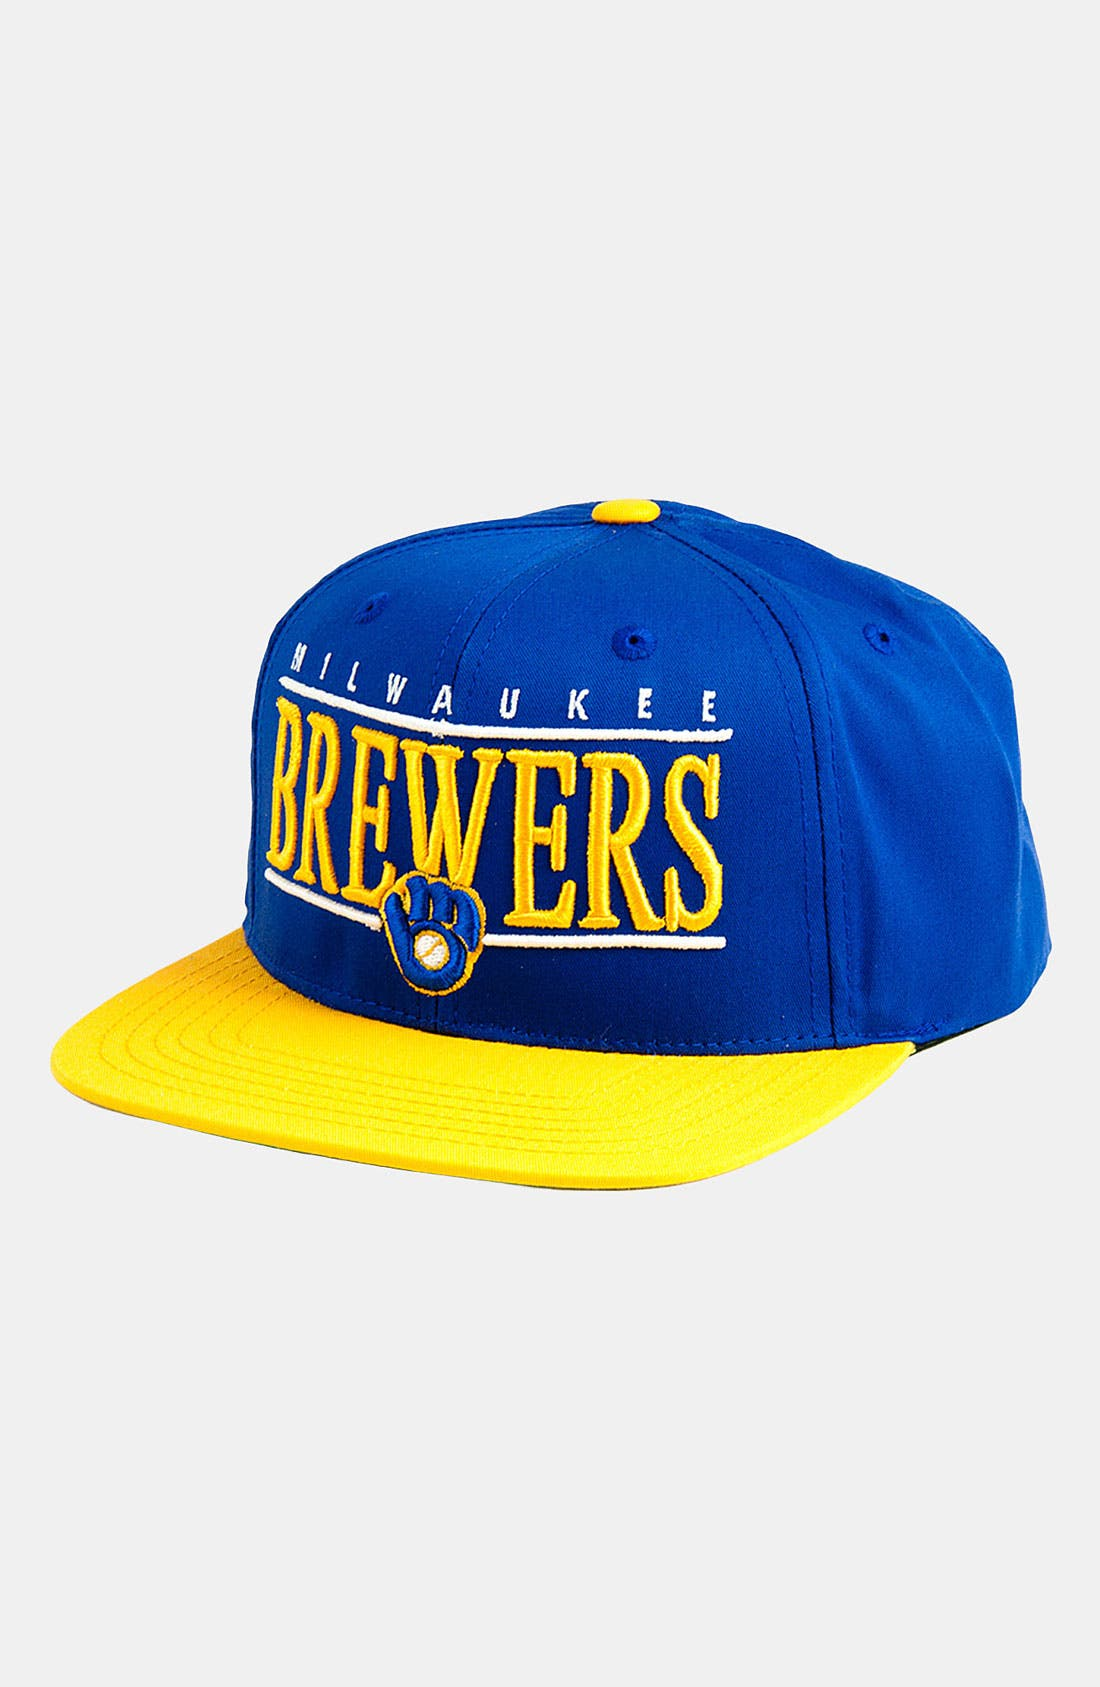 Alternate Image 1 Selected - American Needle 'Milwaukee Brewers - Nineties' Twill Snapback Baseball Cap